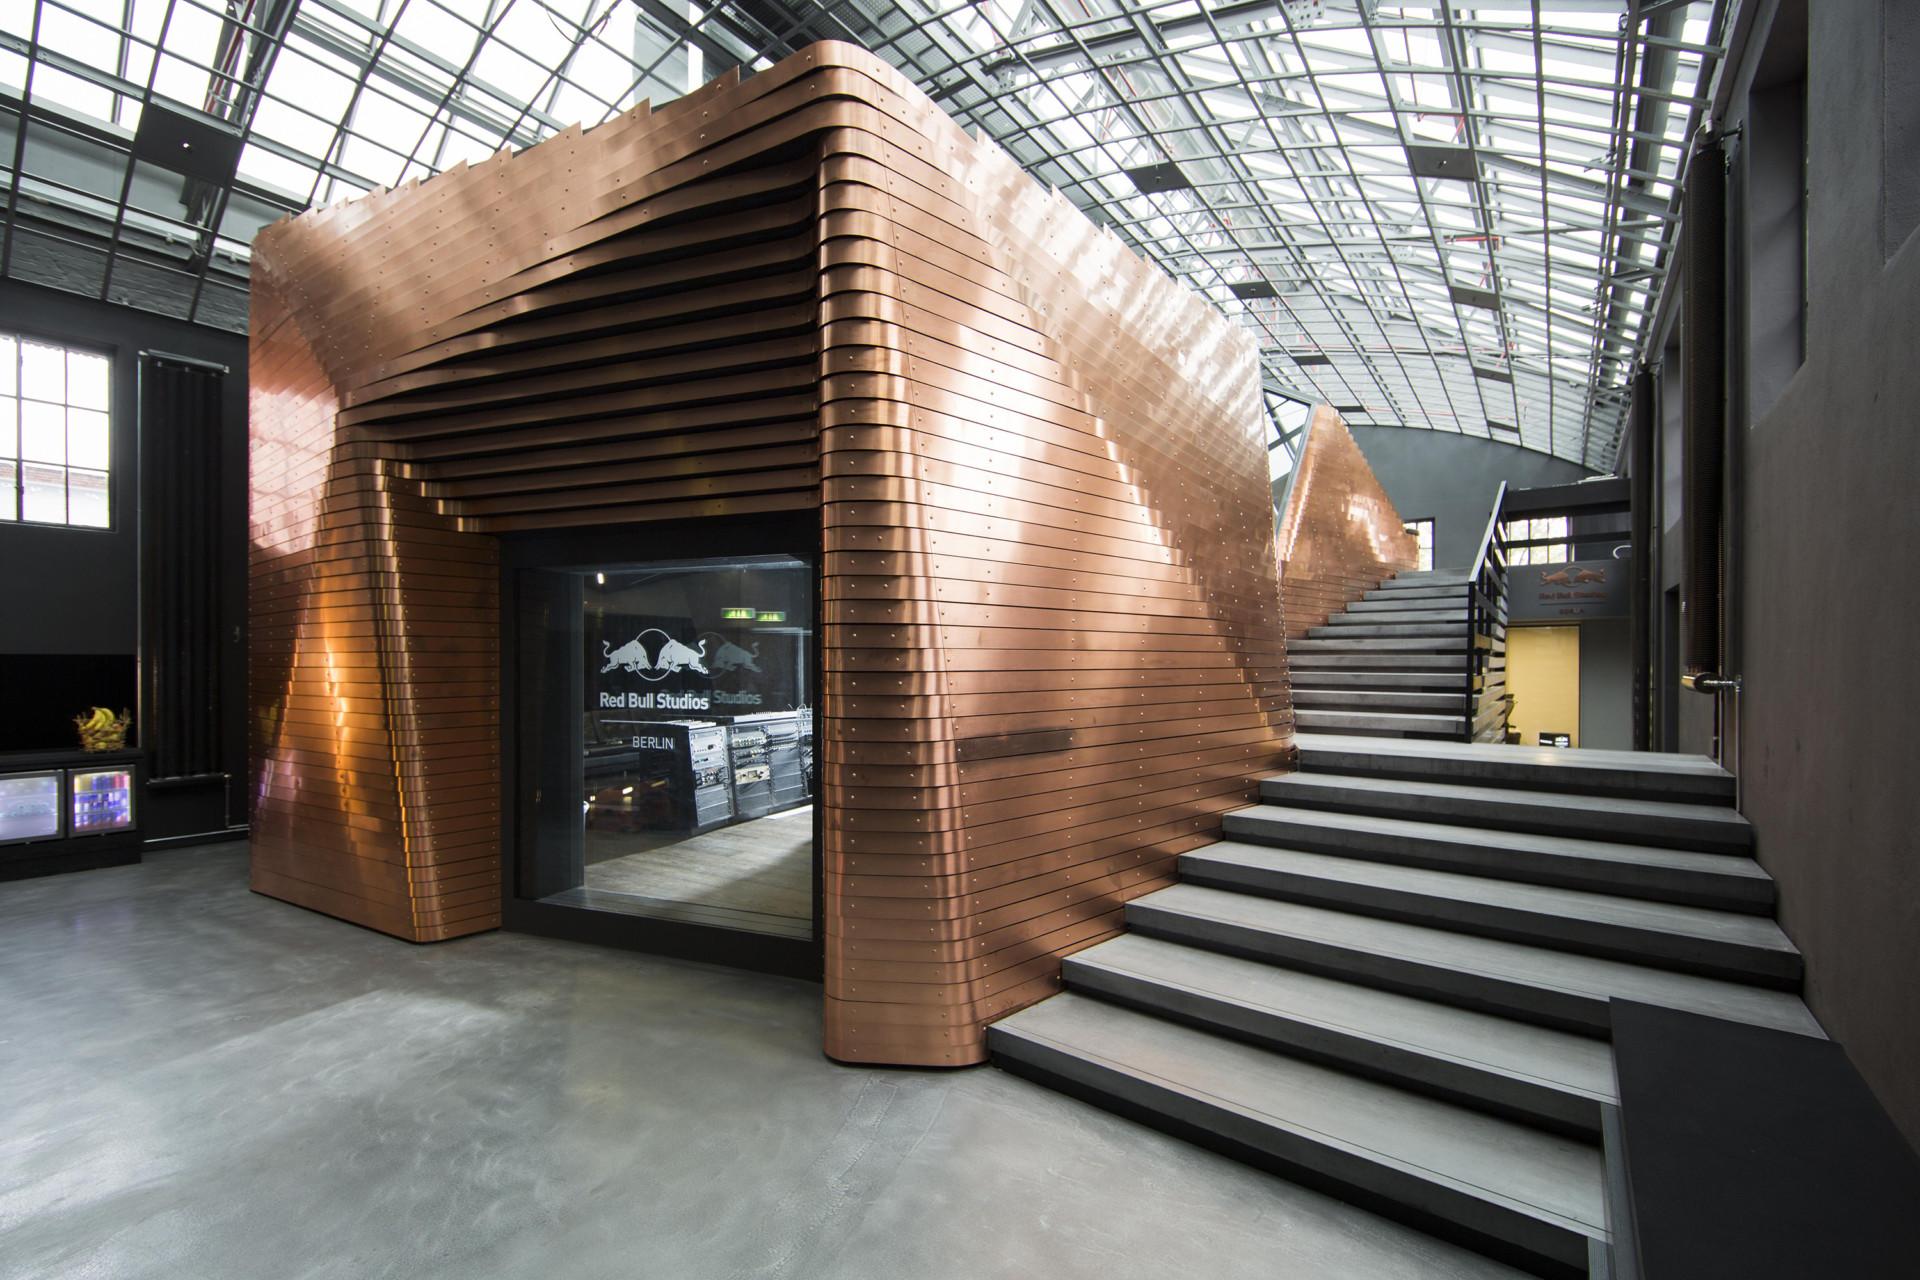 JOHANNES AMMLER RB Studios Berlin